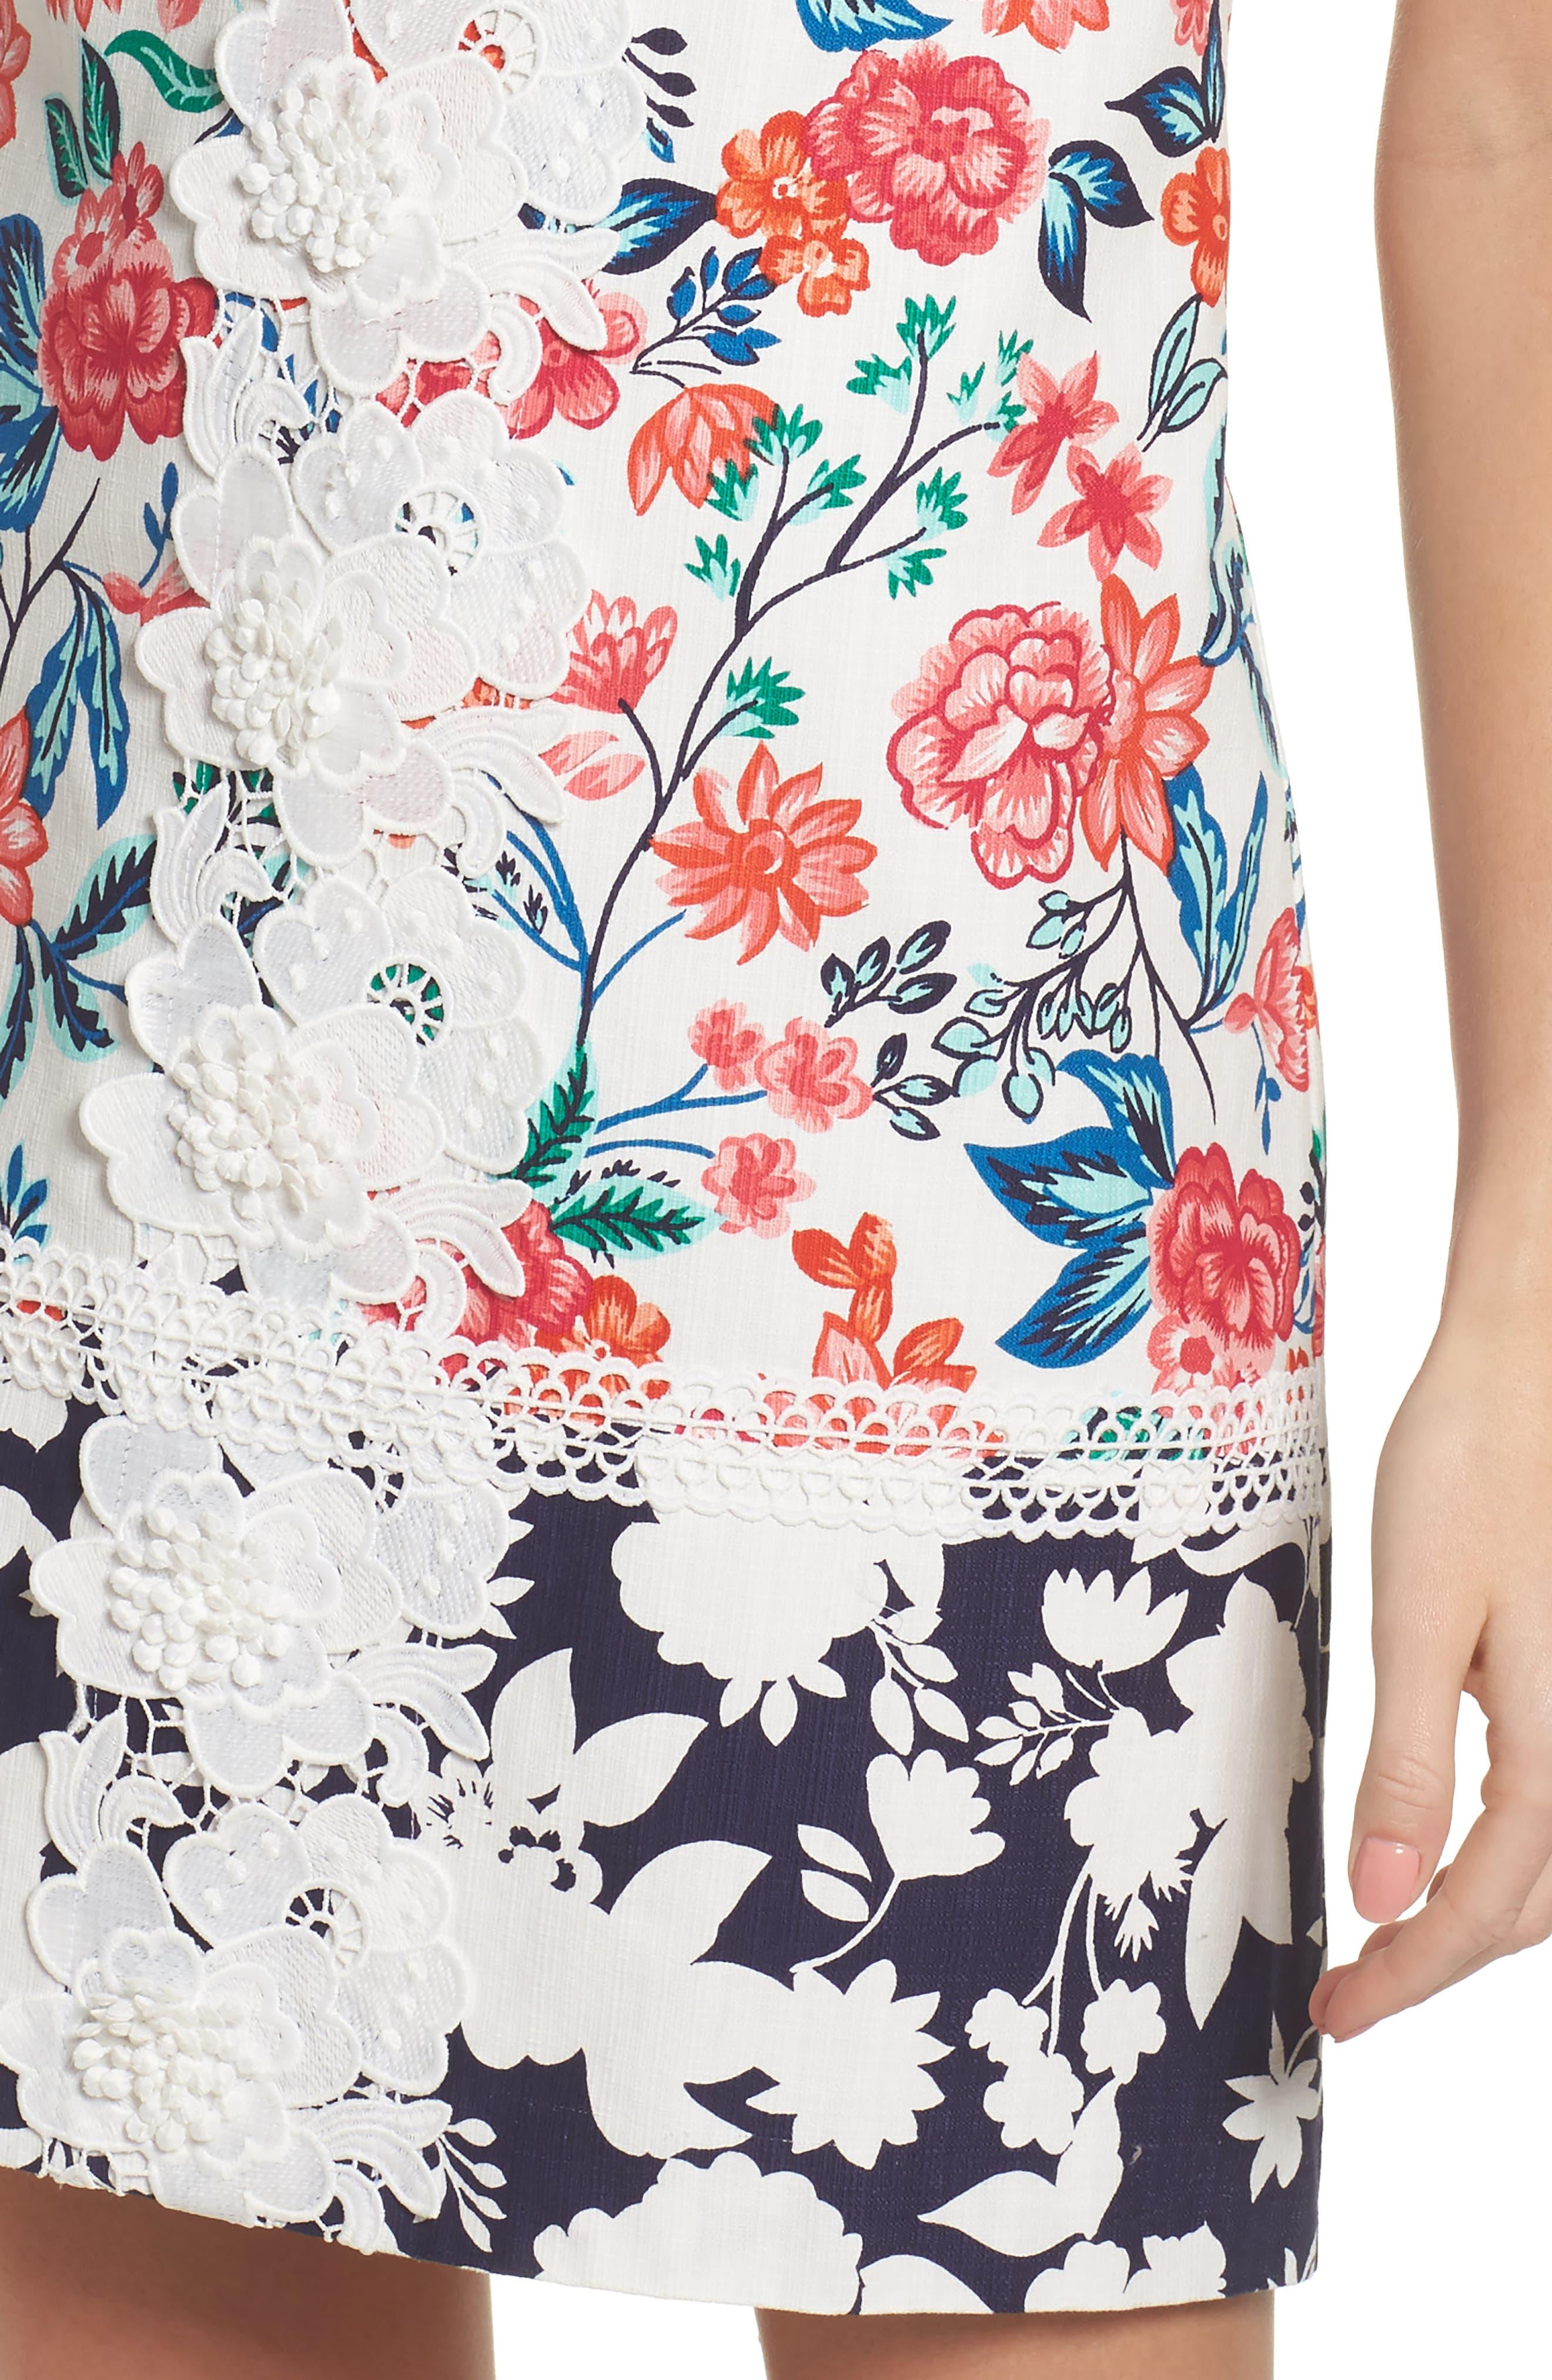 Floral Print Shift Dress,                             Alternate thumbnail 4, color,                             White